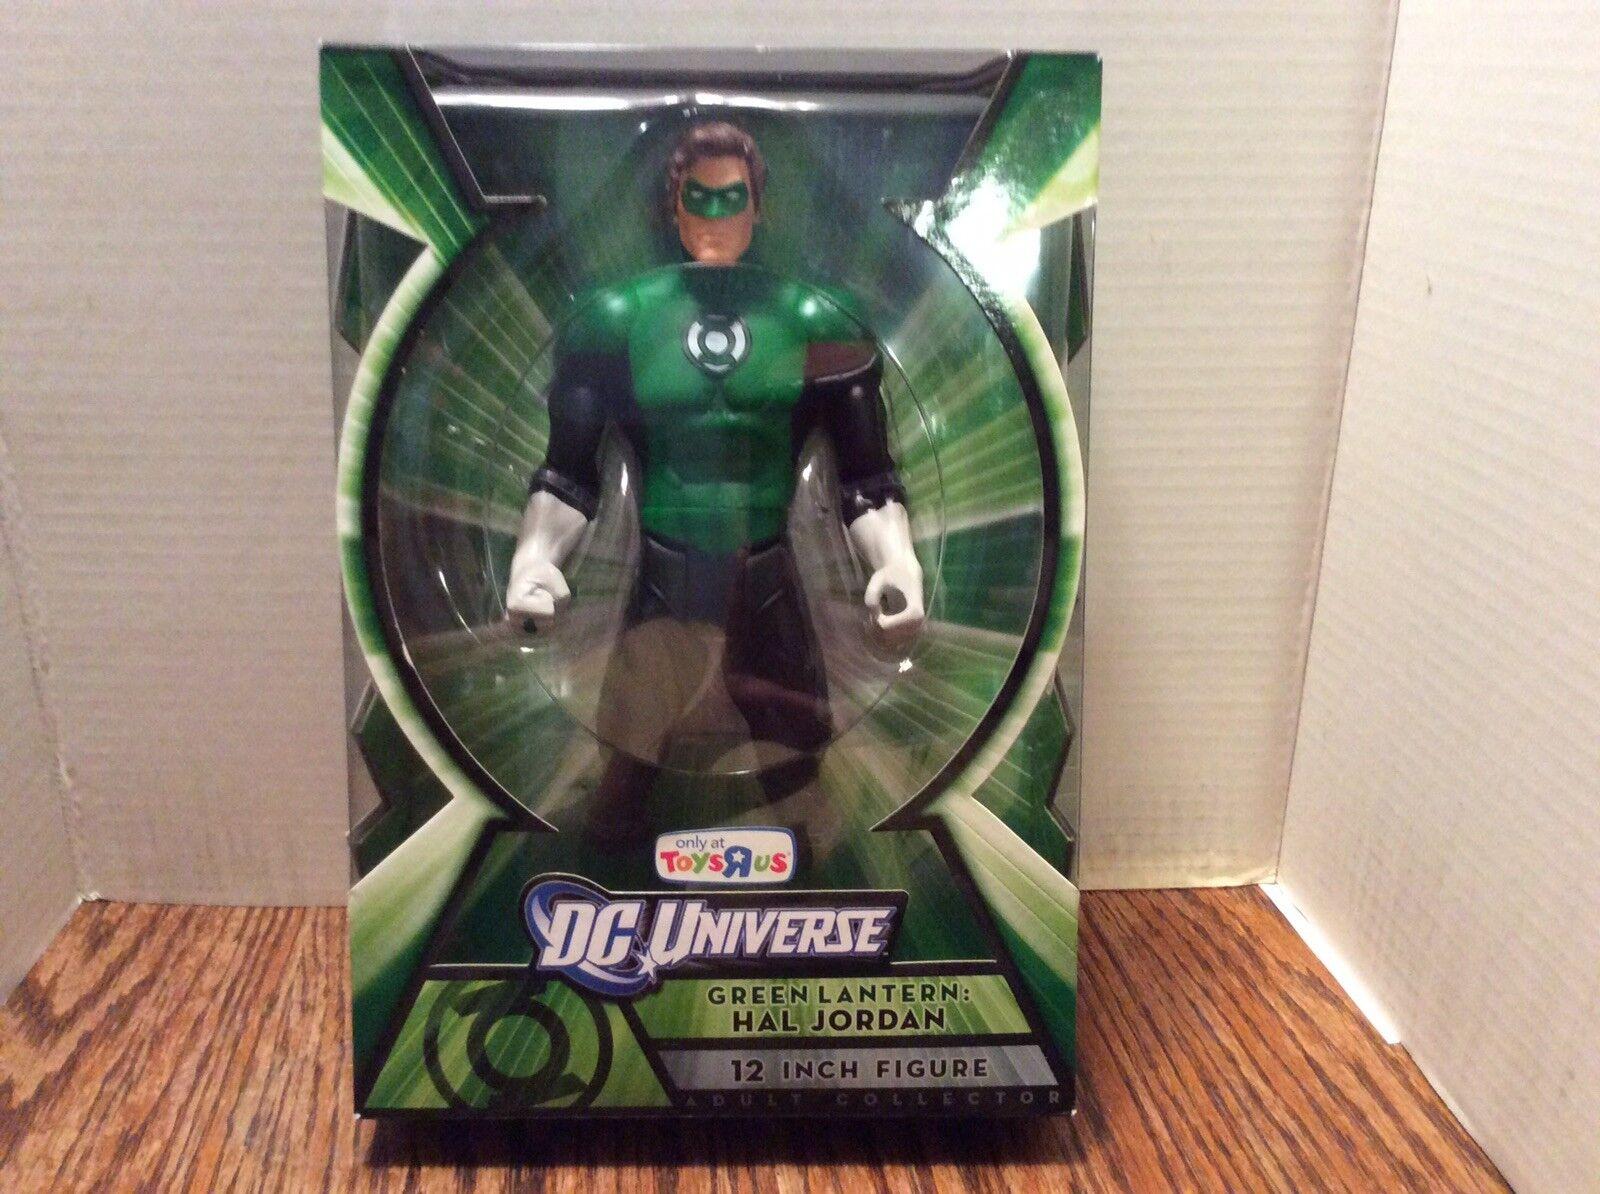 DC Universo 12 in (approx. 30.48 cm) Linterna verde Hal Jordan